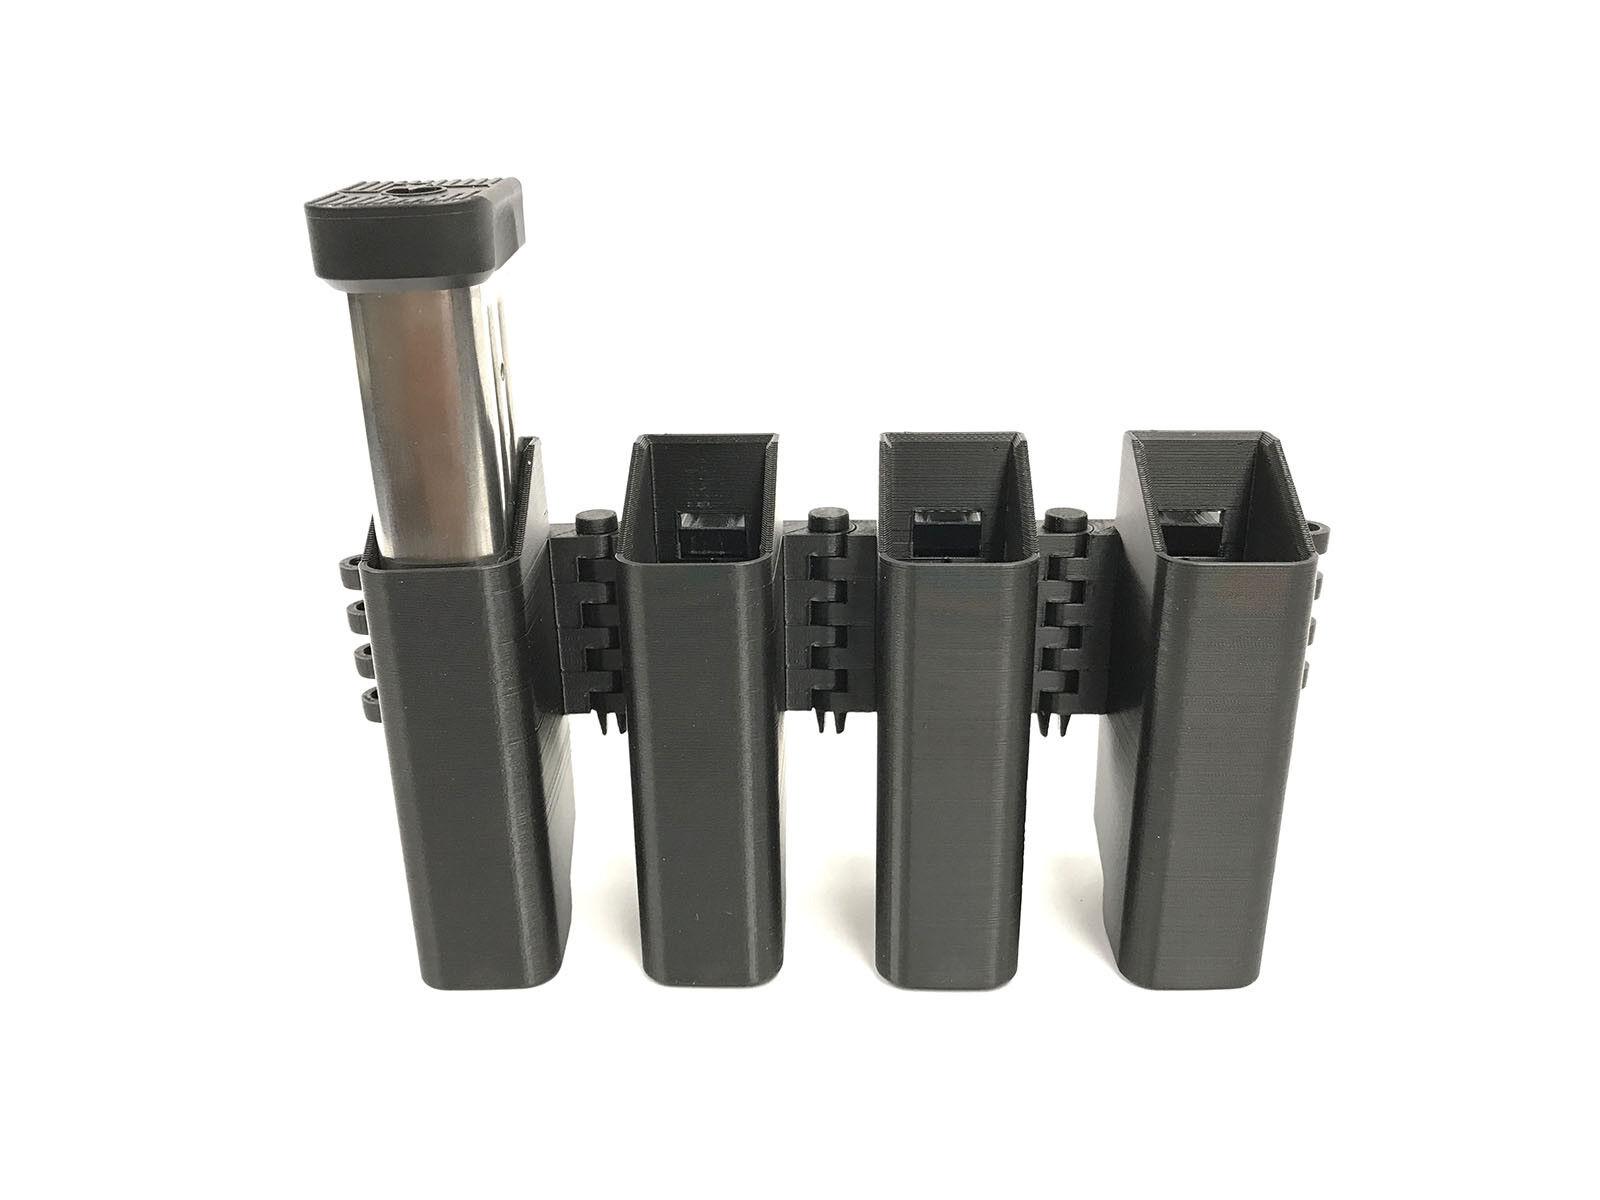 EAMP Enforcer - 2011 9mm Quad Mag Pouch - 0460-D